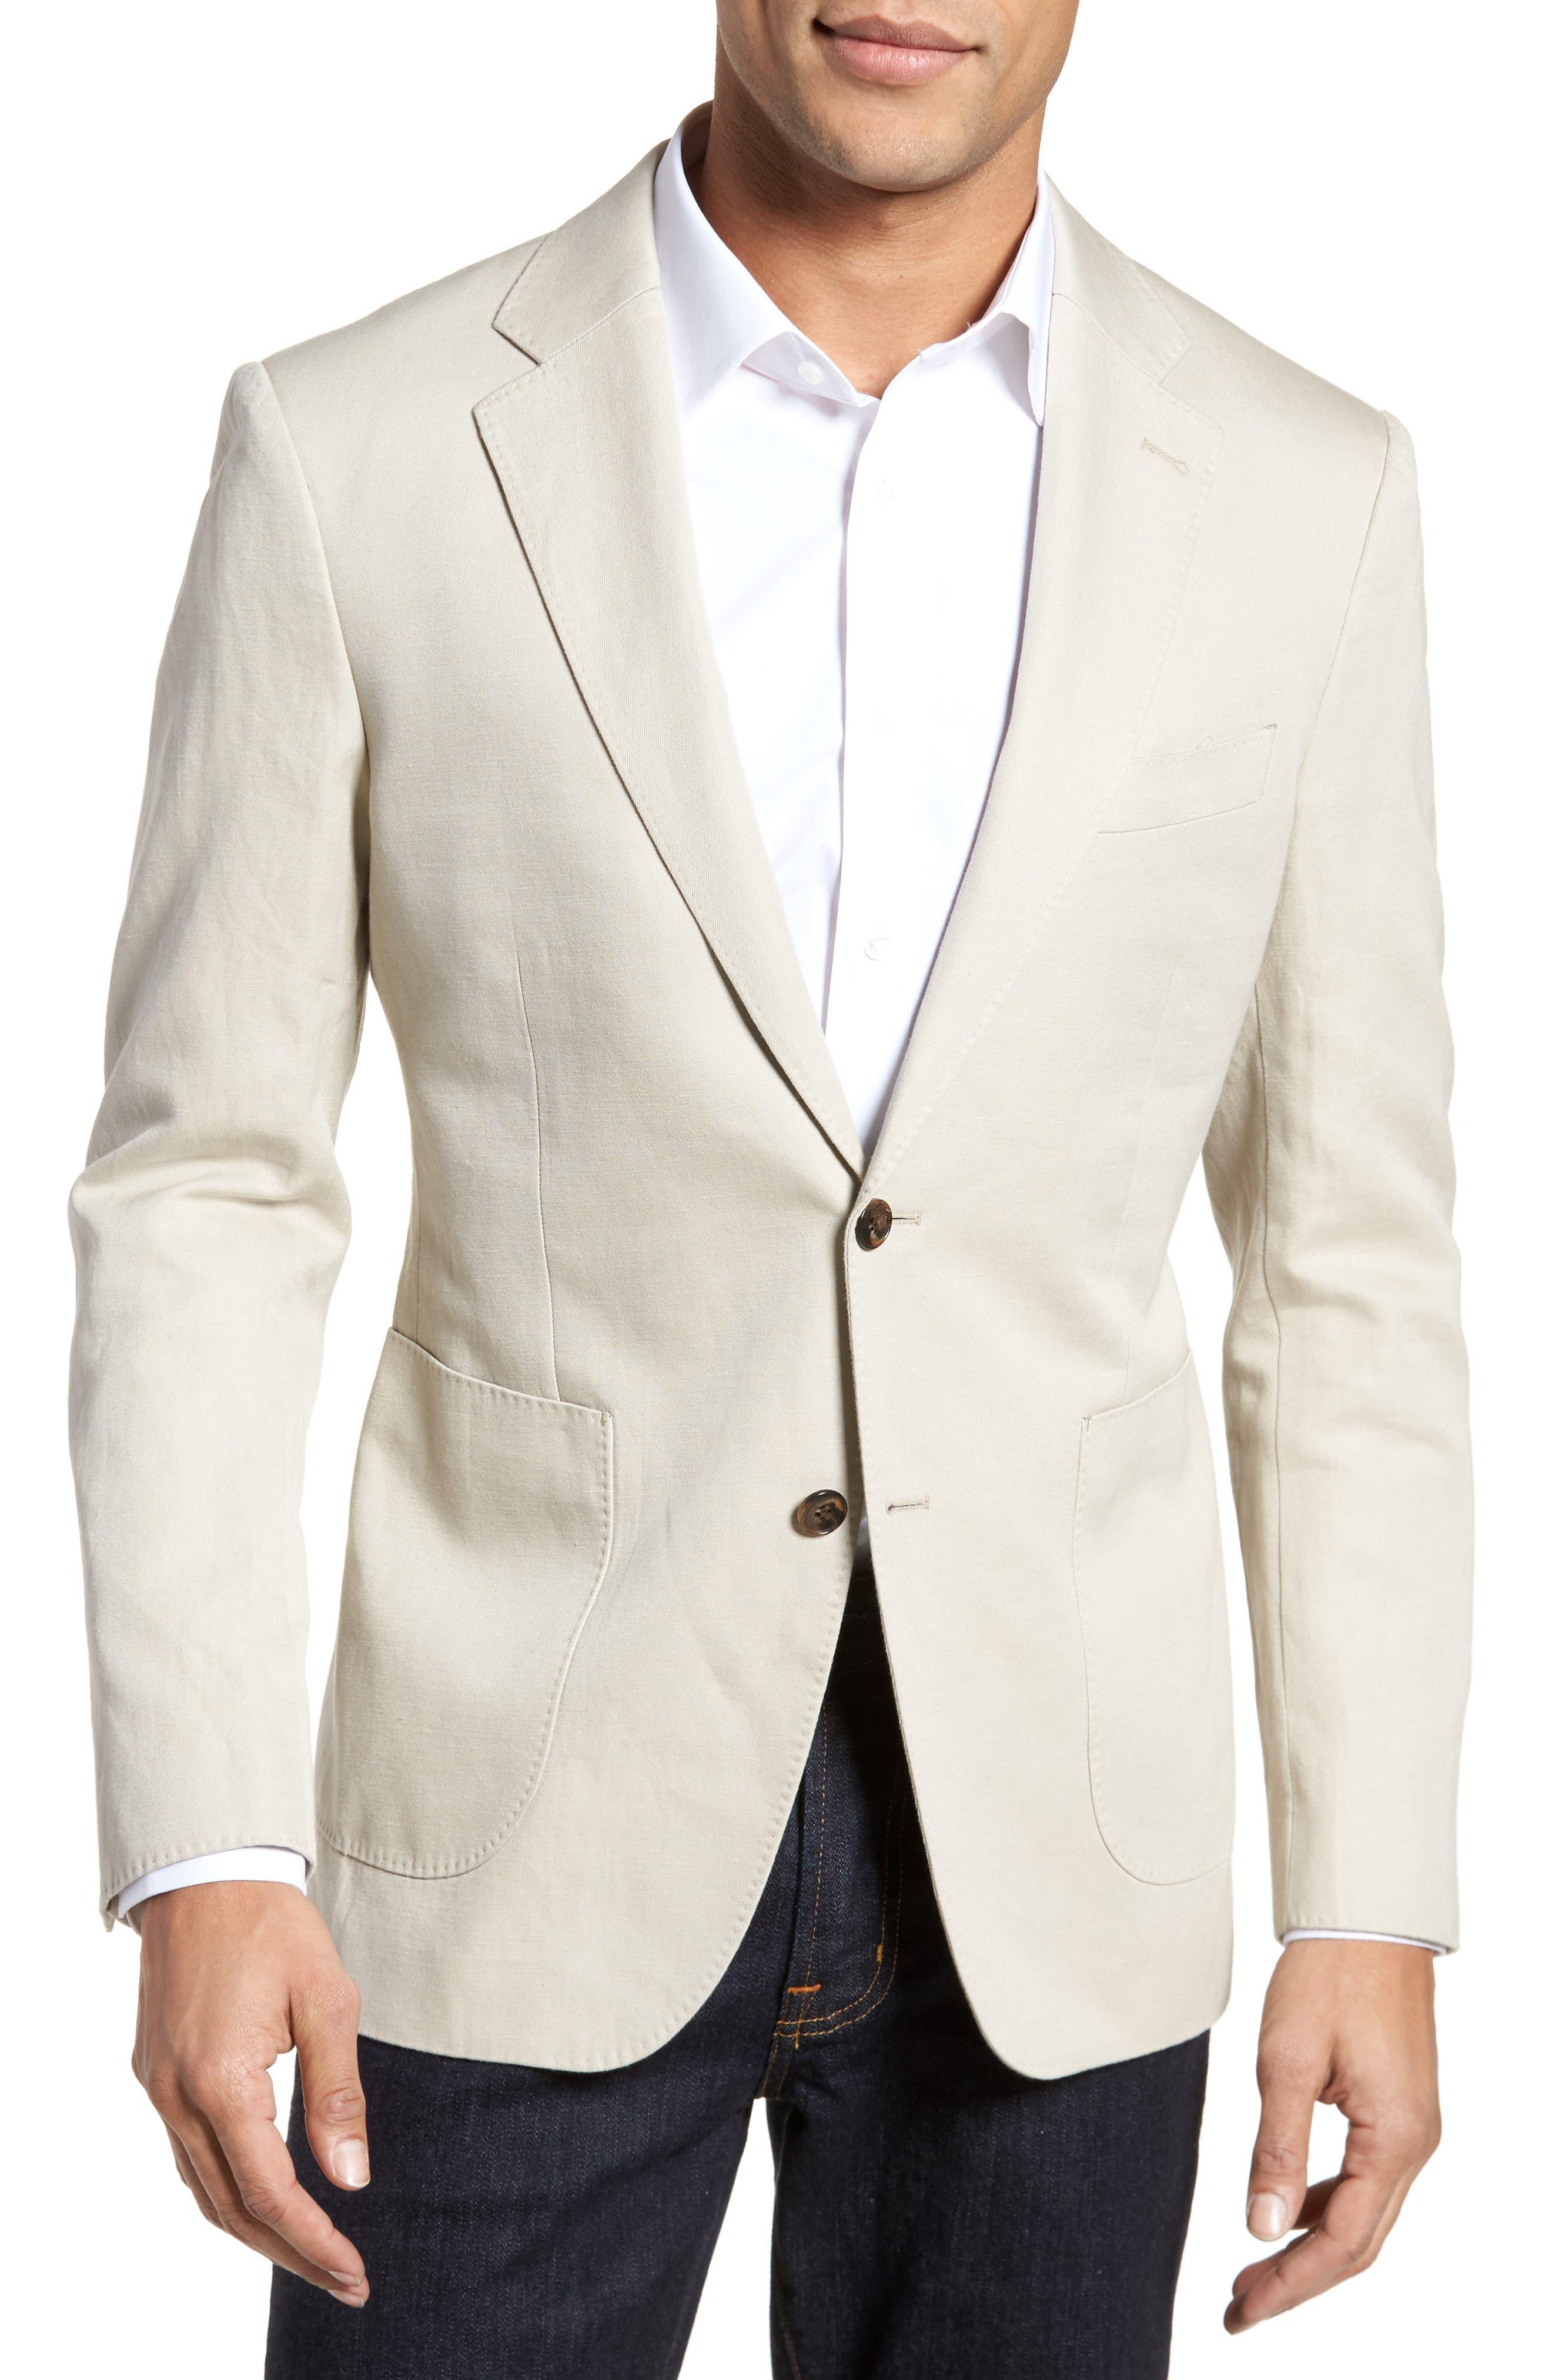 Maxwell Valley Cotton & Linen Sport Coat,                             Main thumbnail 1, color,                             Natural